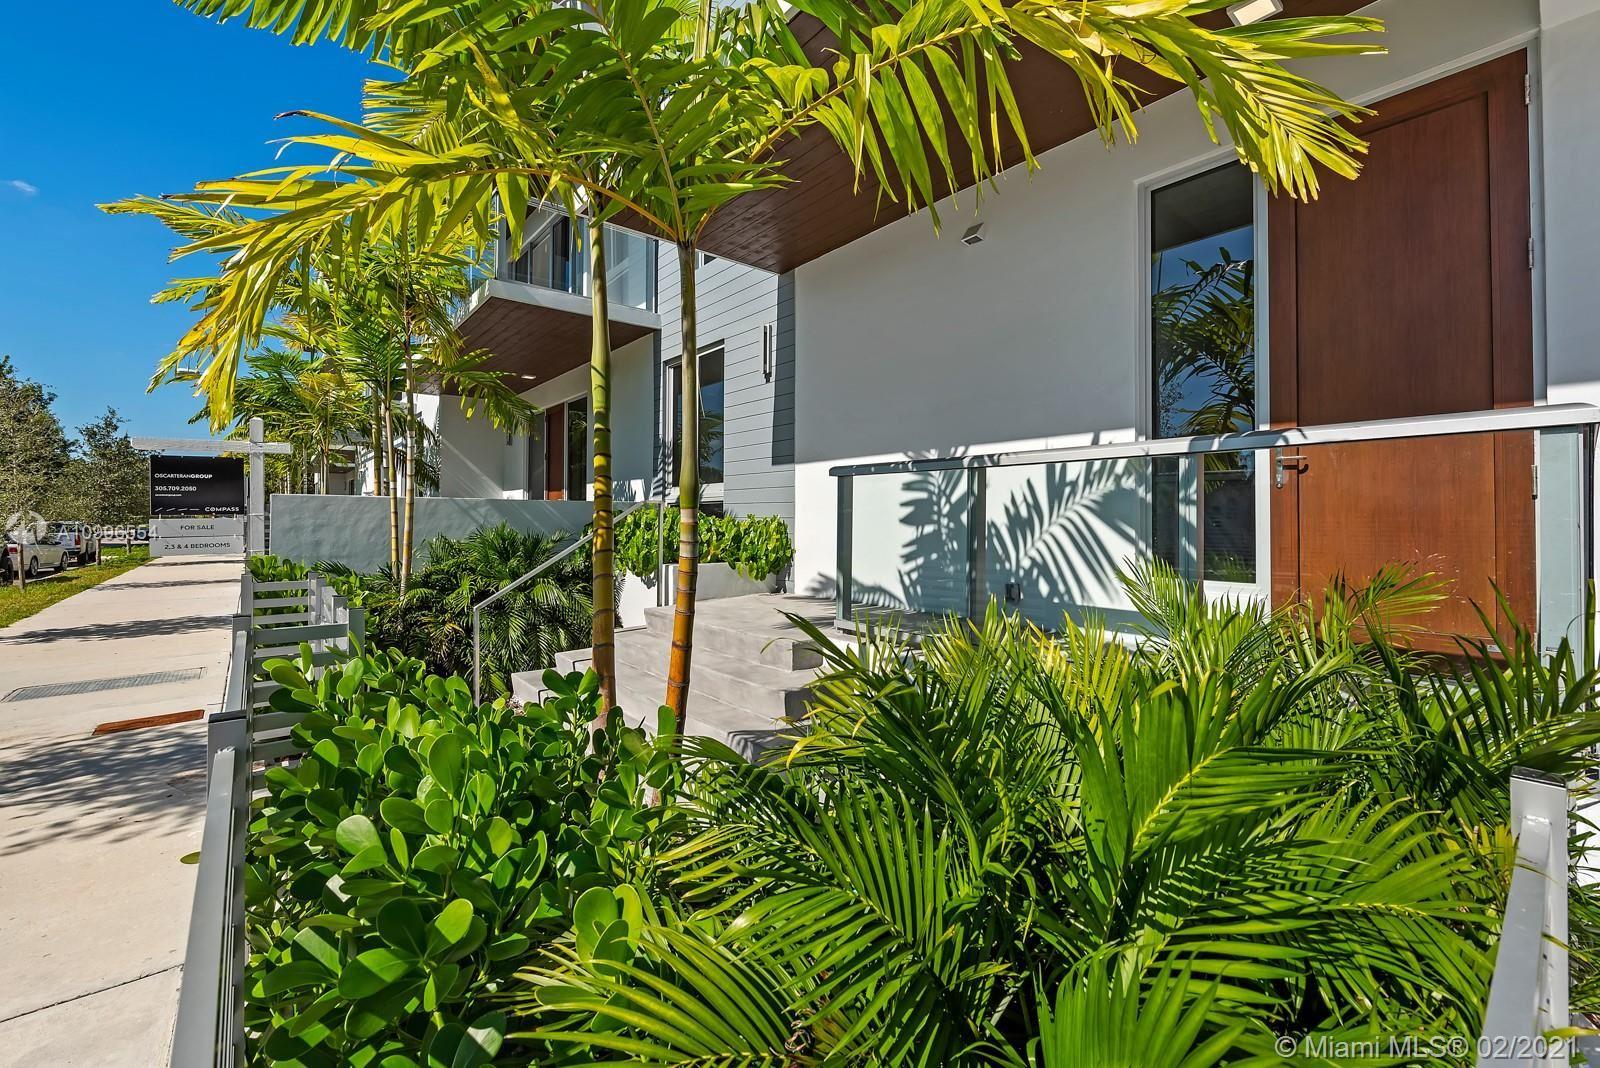 529 SW 11th STREET #101, Miami, FL 33129 - #: A10996554